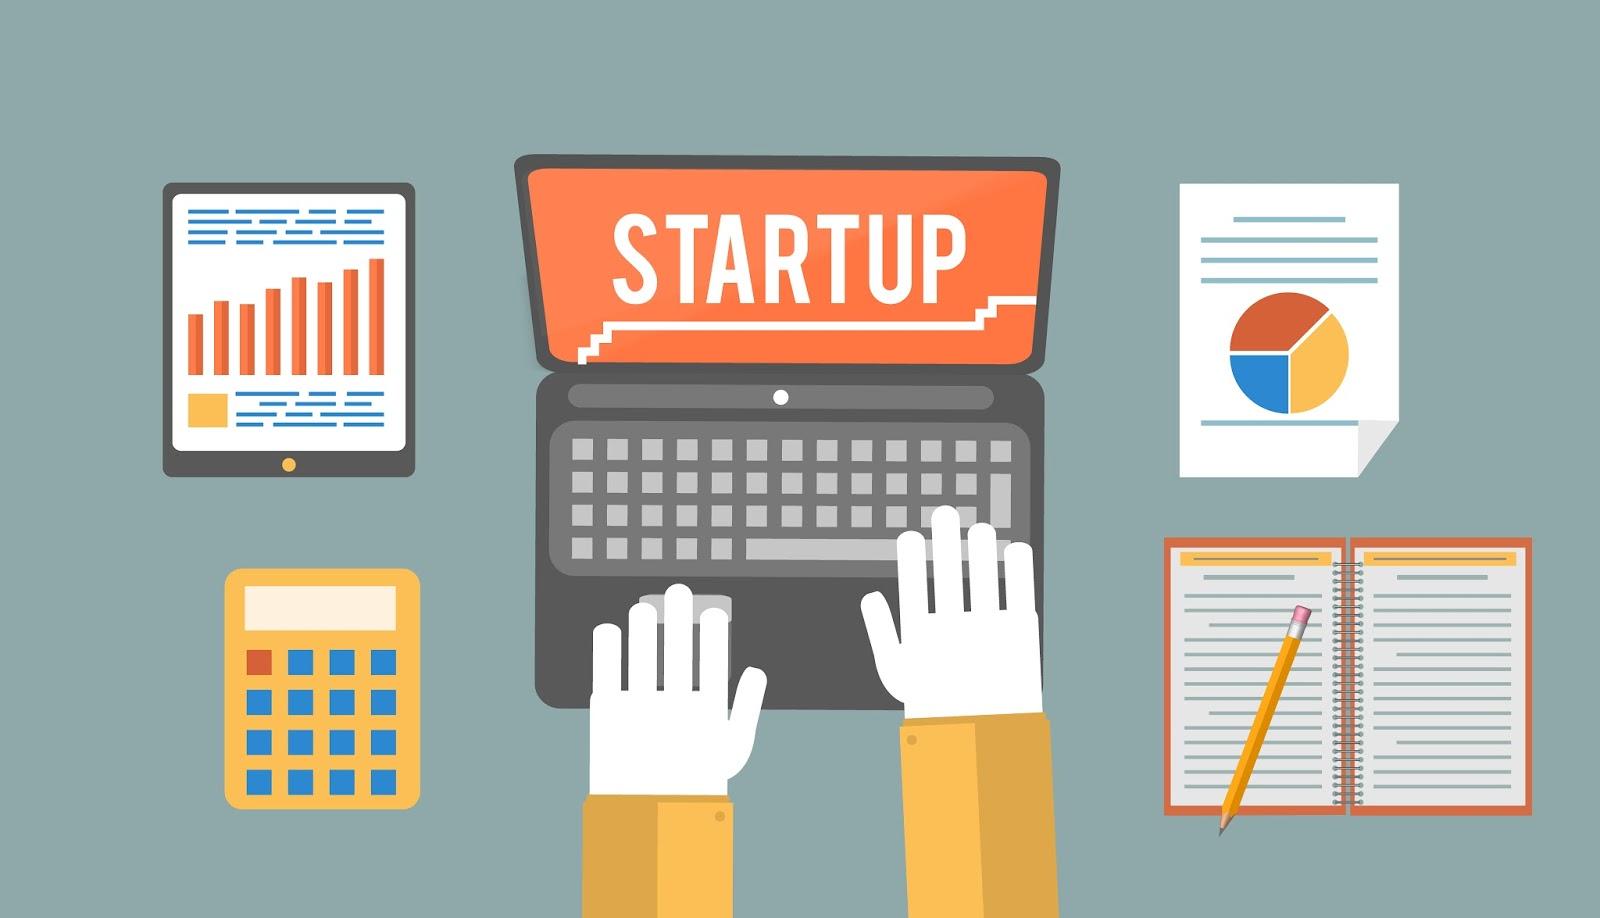 5-van-de-phap-ly-ma-startup-nhat-dinh-phai-biet-de-tranh